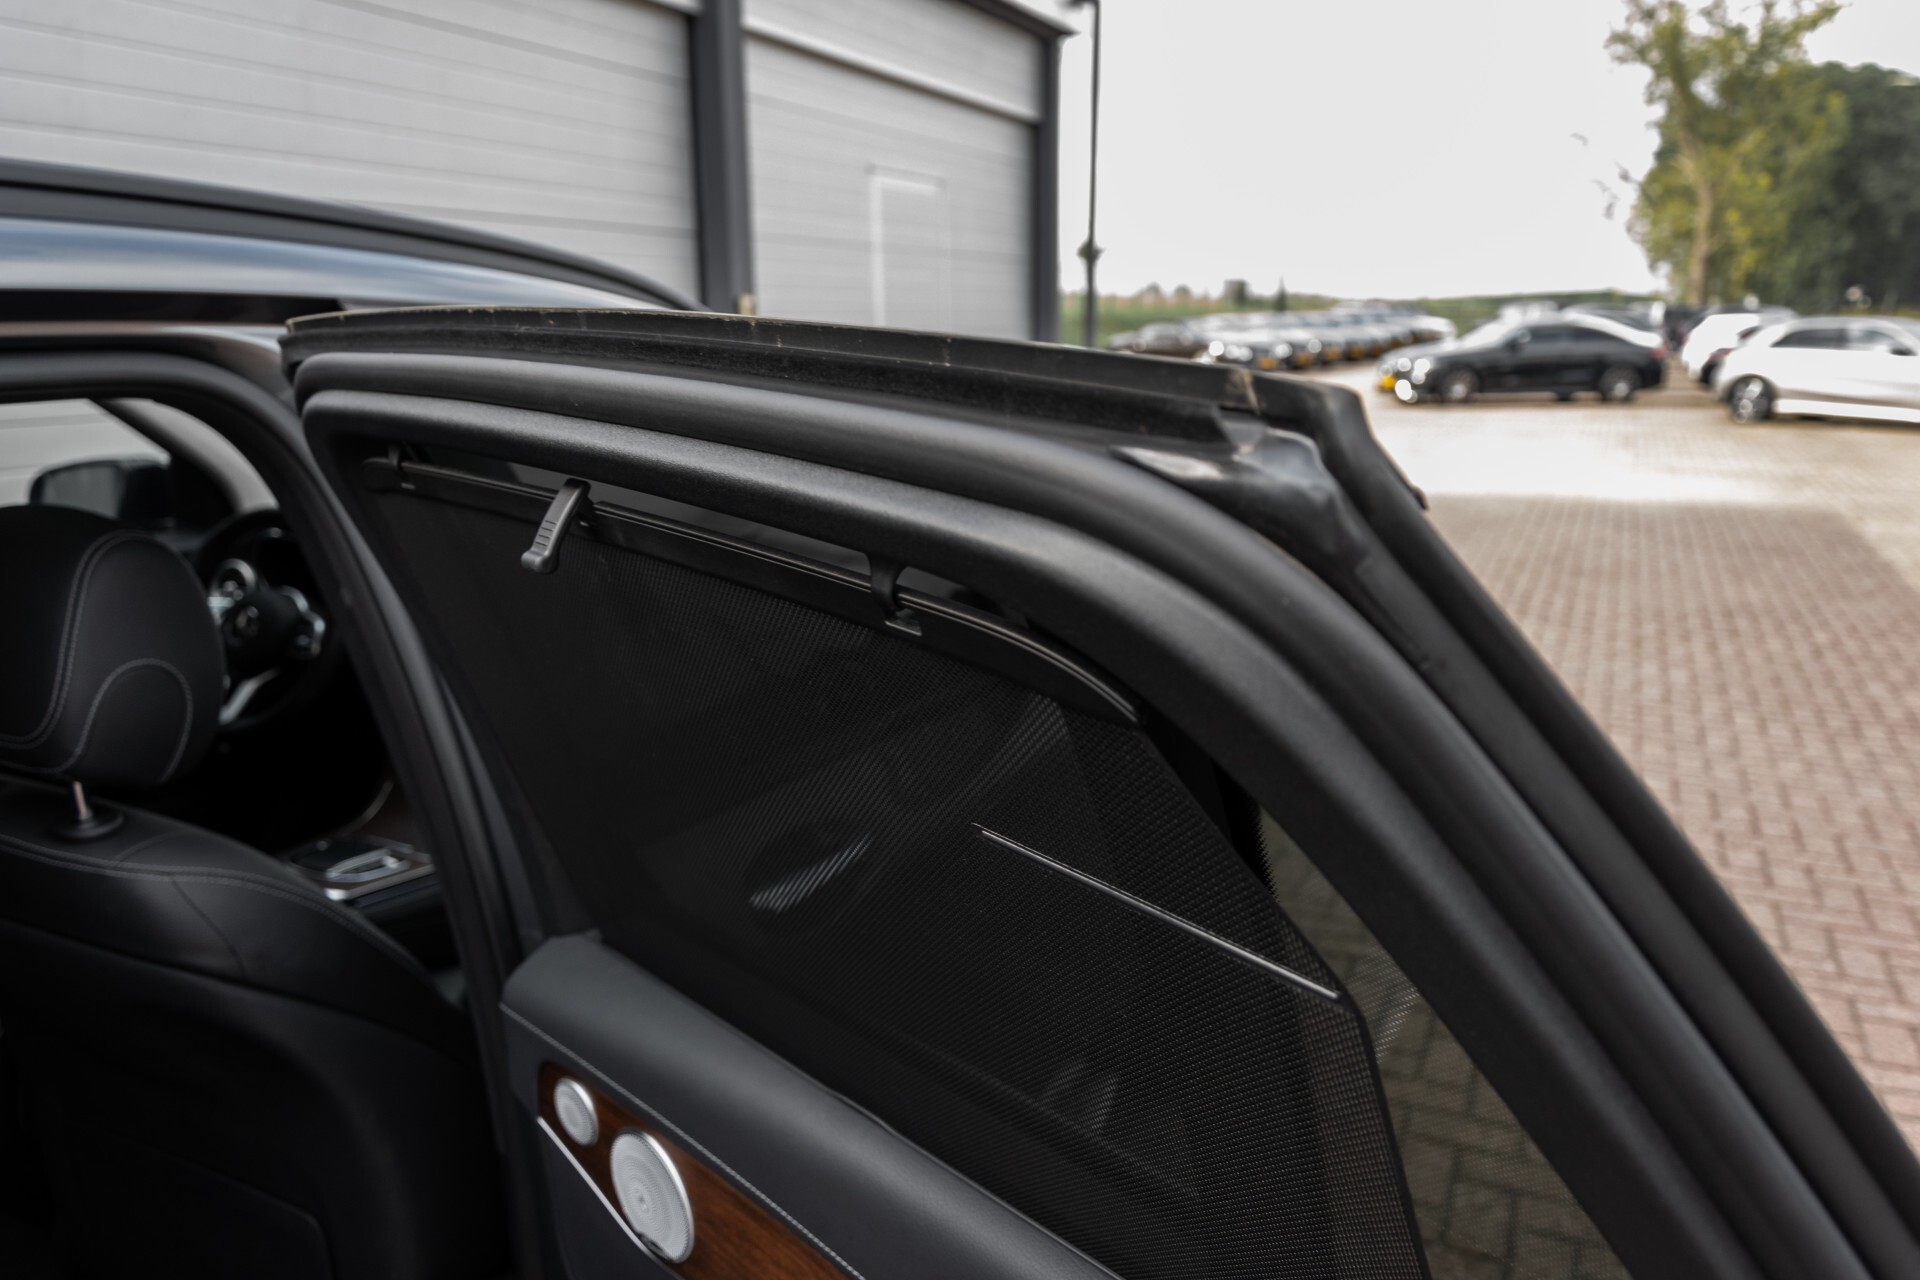 Mercedes-Benz GLC 300e 4-M Luchtvering/Panorama/Multicontourstoelen/Rij-assistentie/Standkachel Aut9 Foto 56